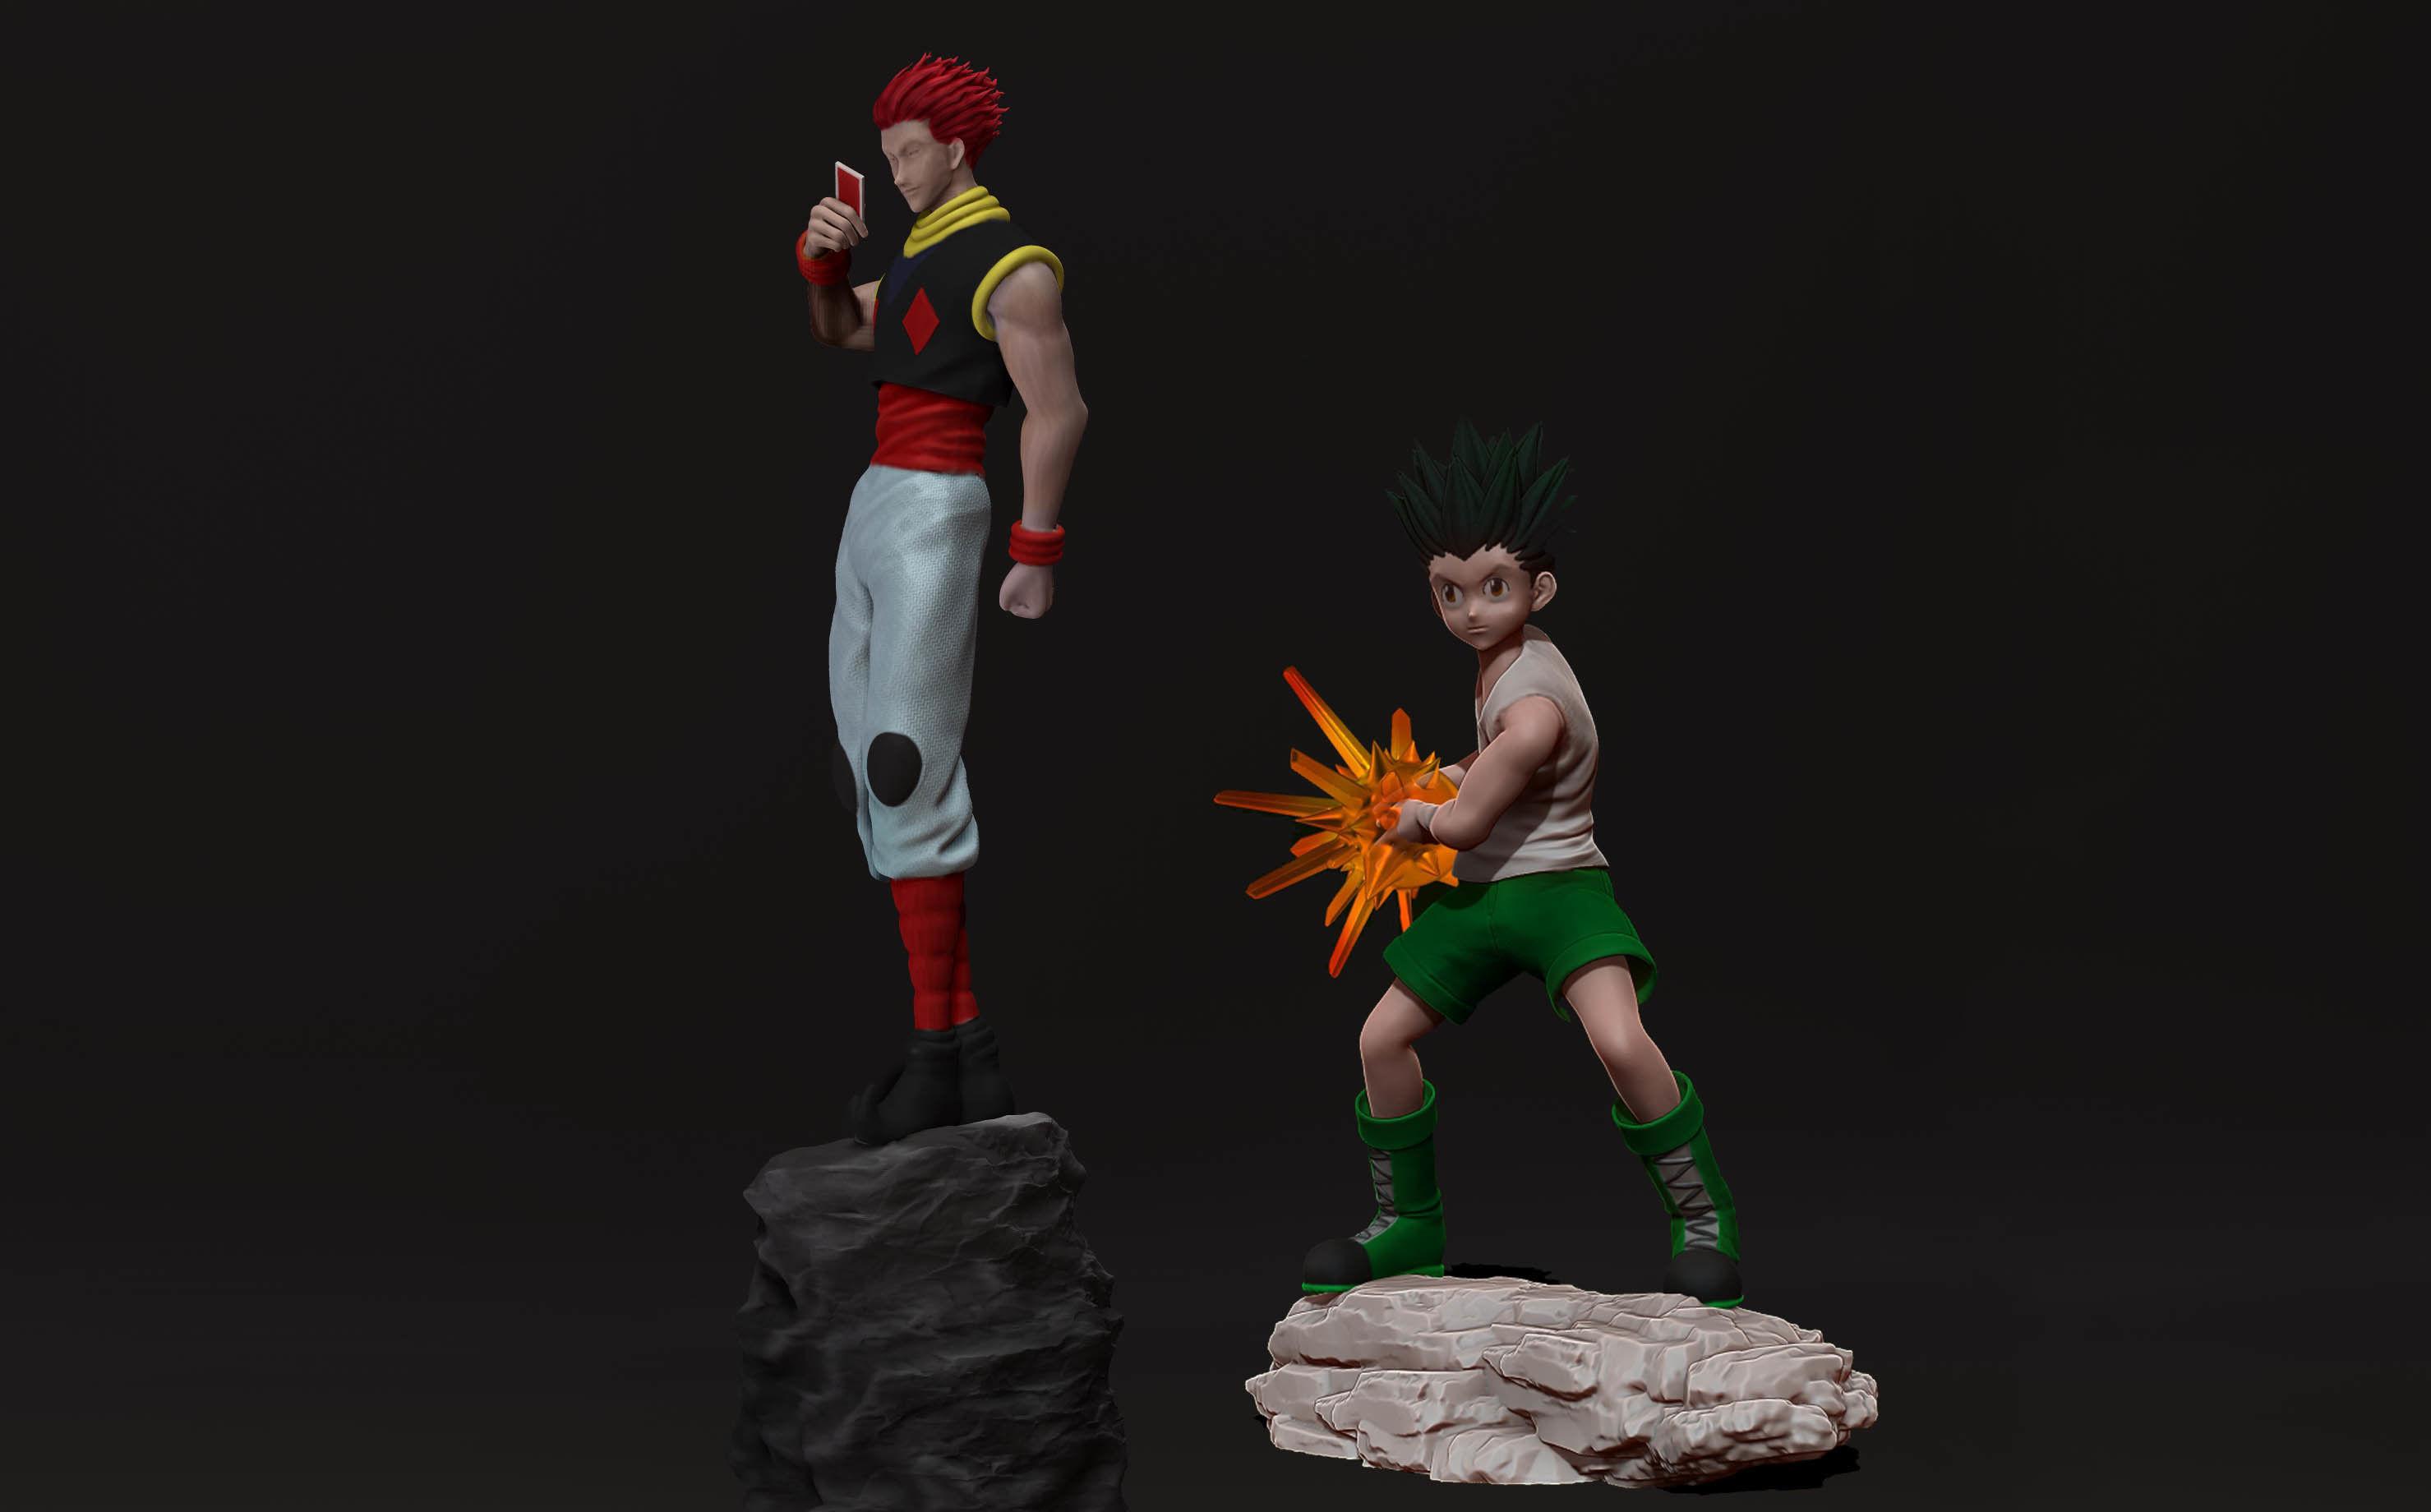 Hunter X Hunter 3d Prints Gon Freecss And Hisoka Morrow